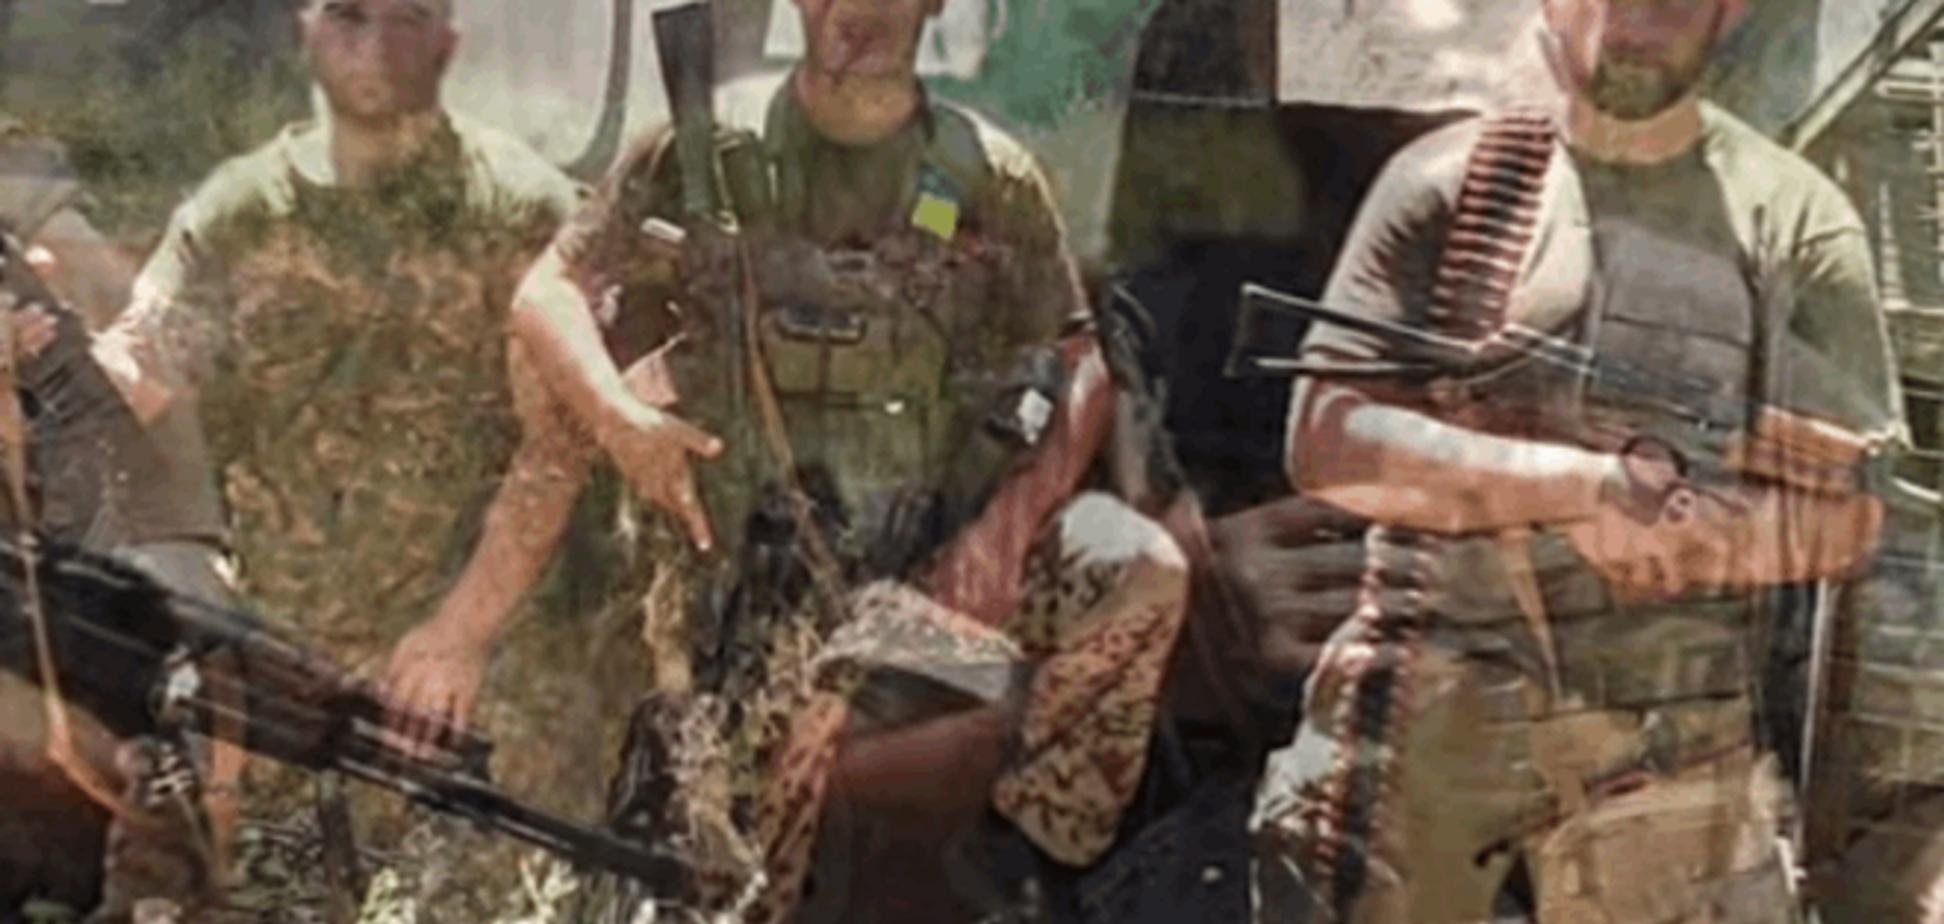 Чеченцы воюют на Донбассе со словами 'Слава Украине': видеофакт